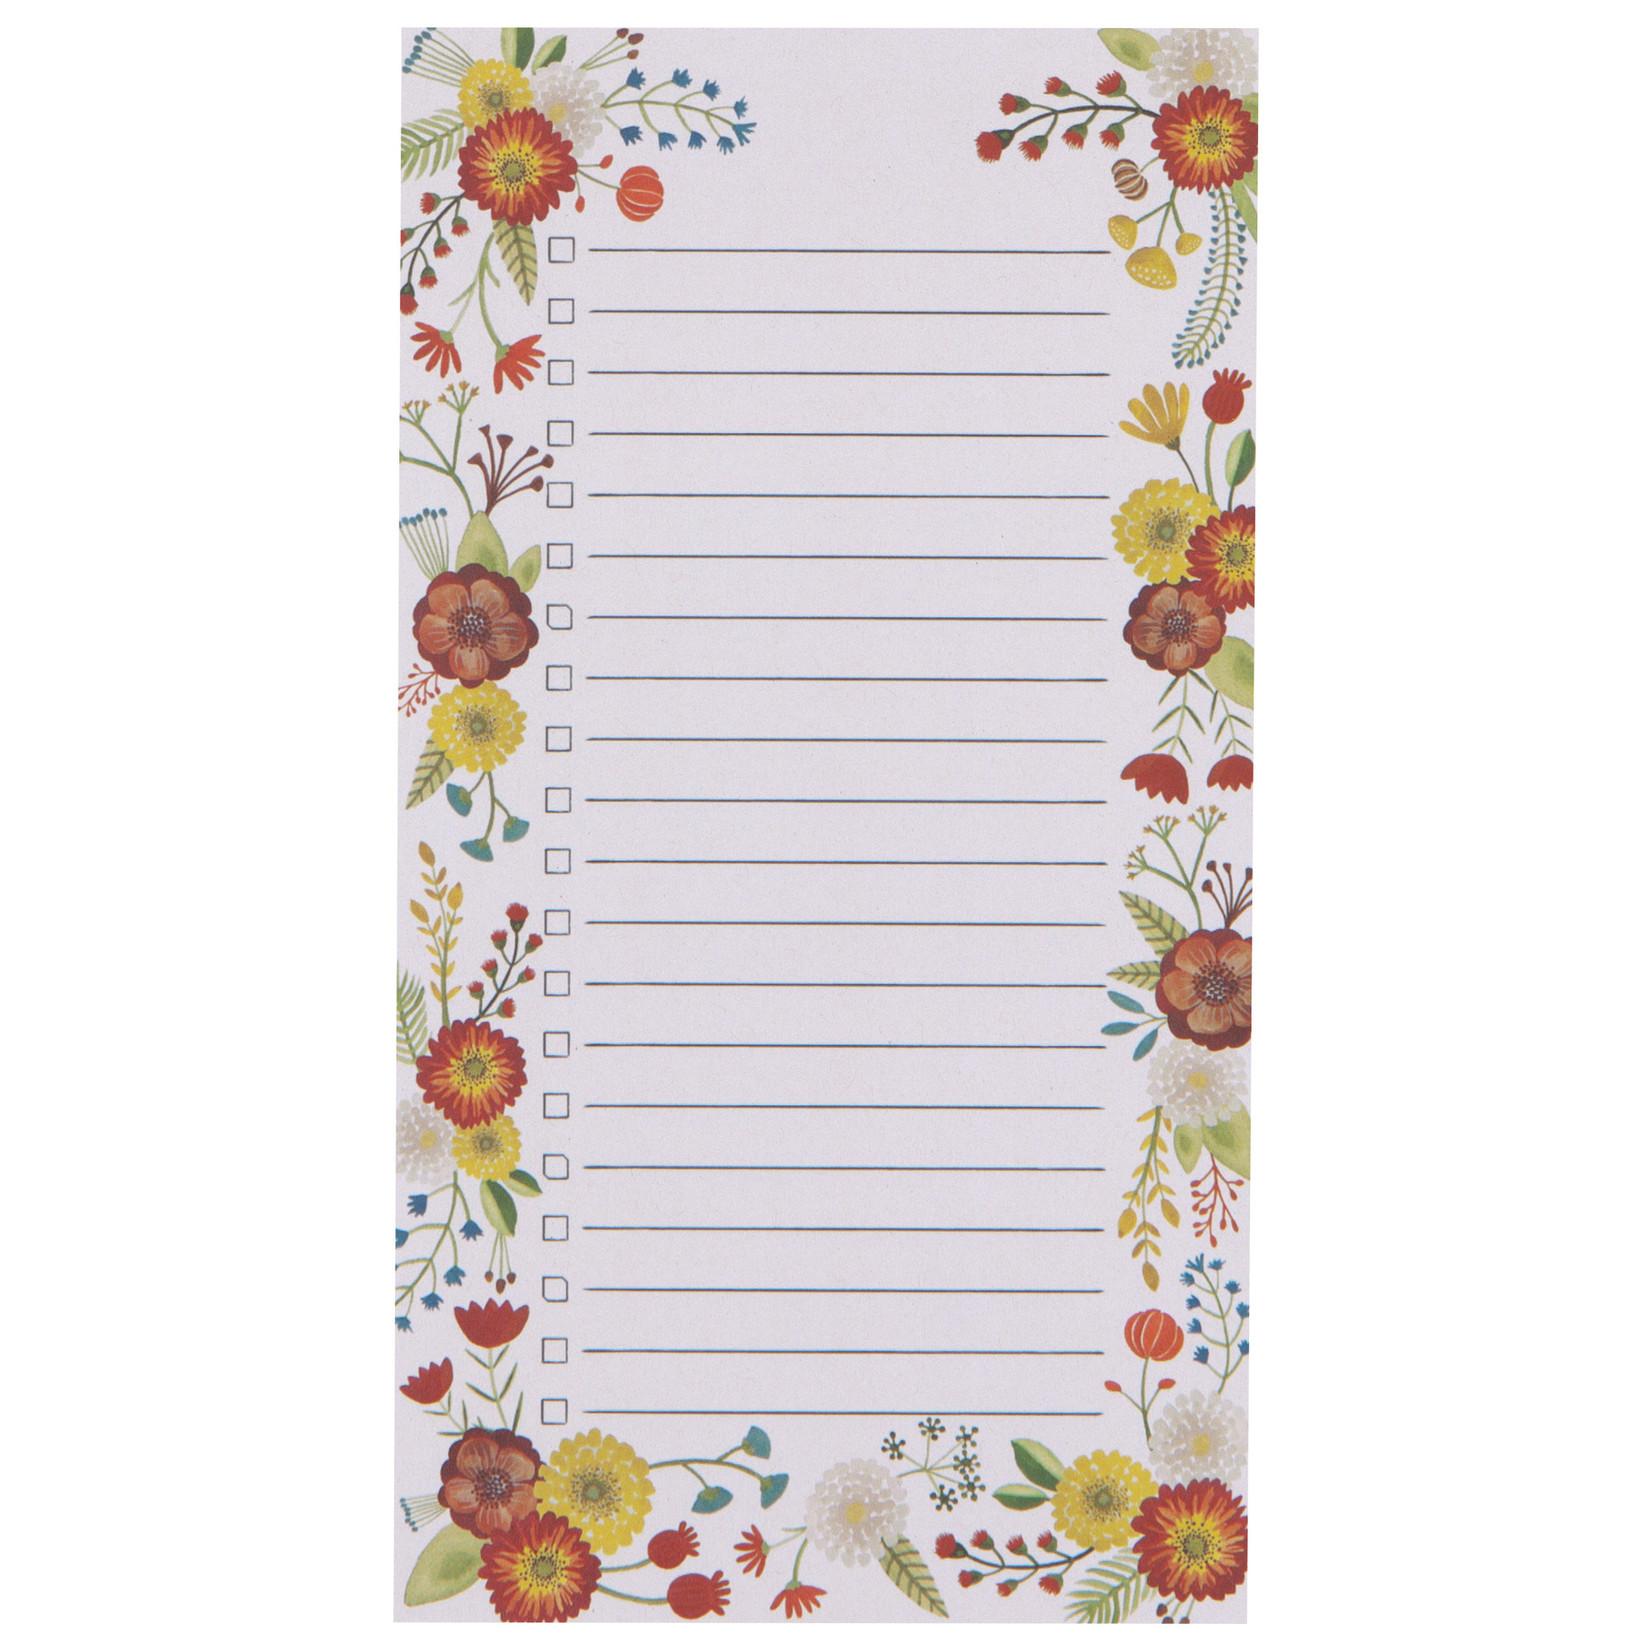 Notepad - Goldenbloom